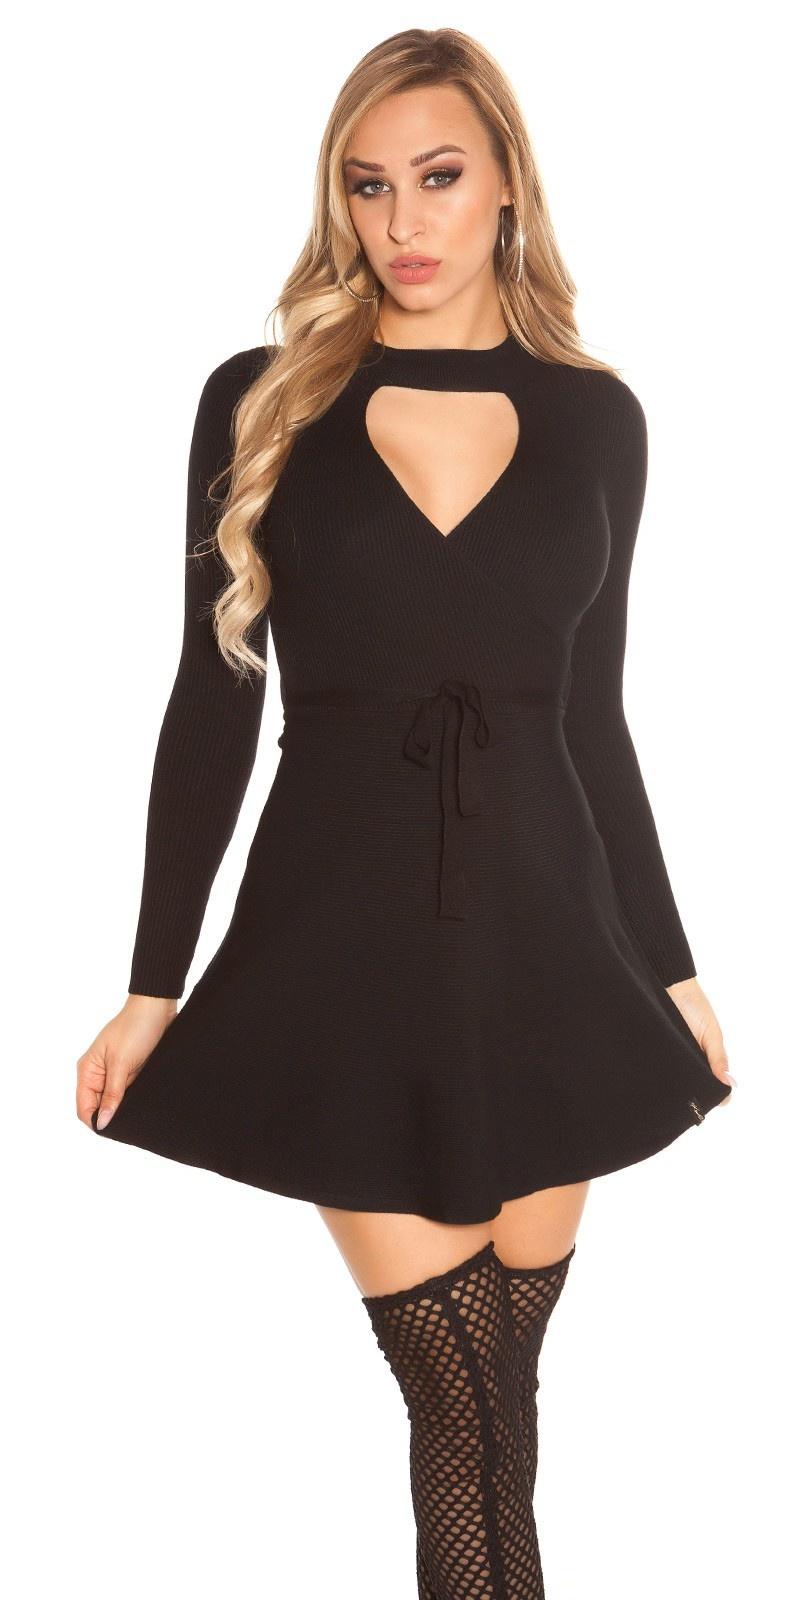 Sexy geribde gebreide jurk wikkel look zwart